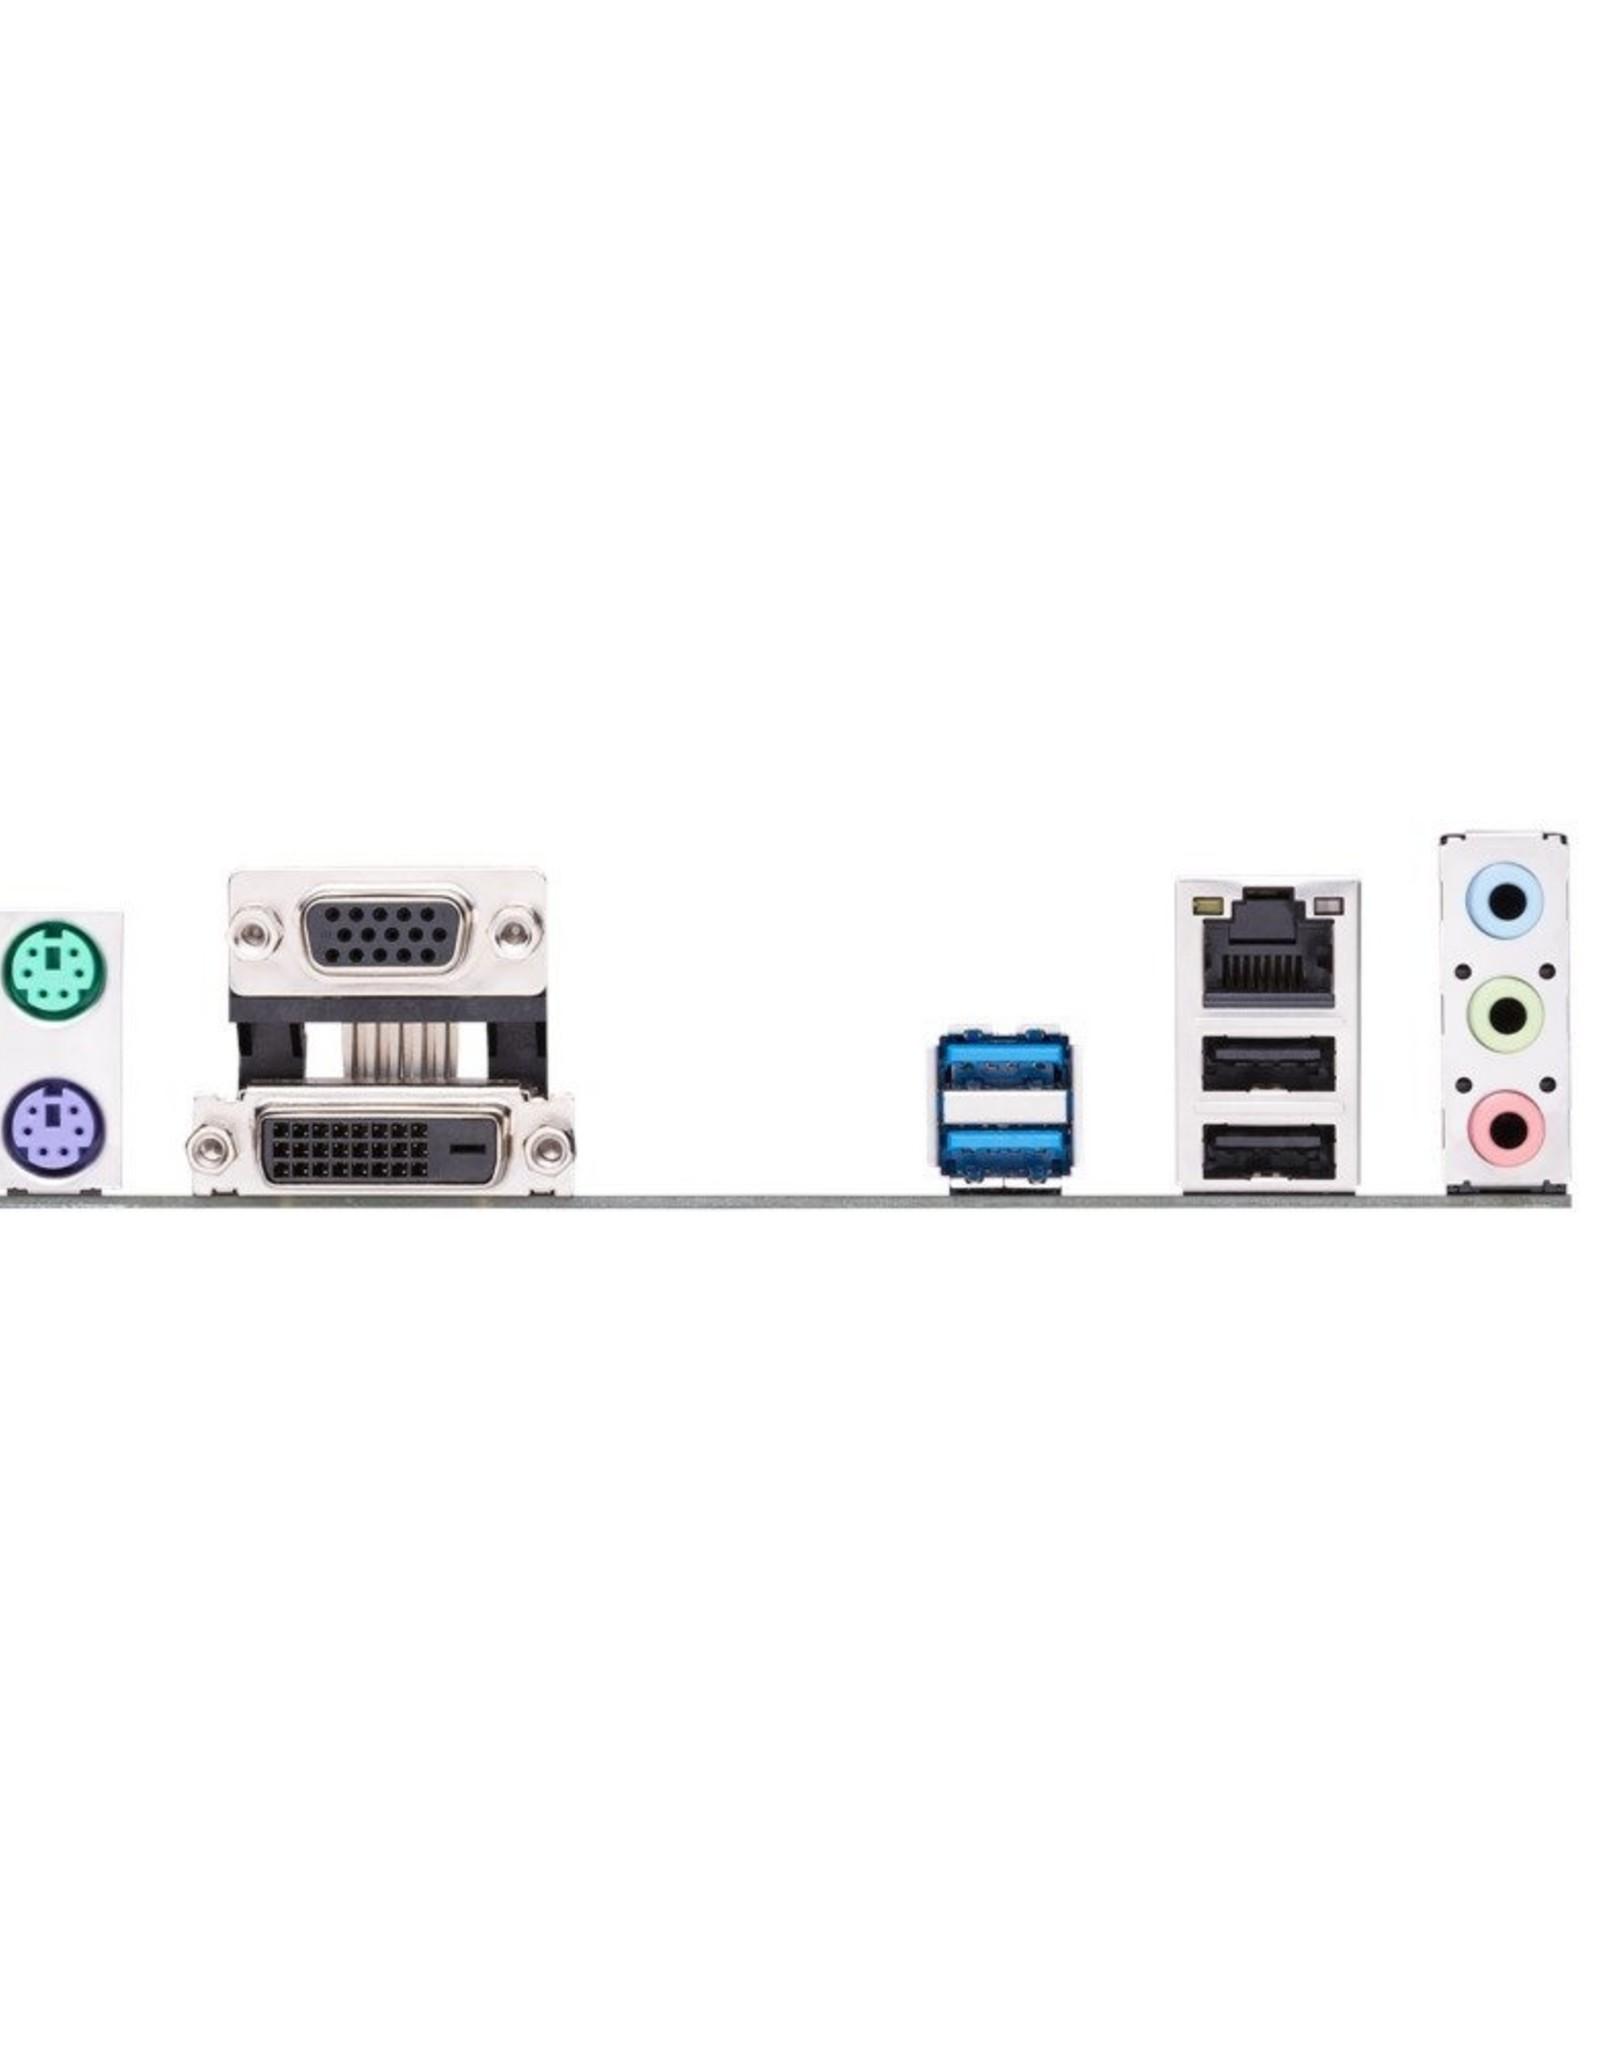 MB  Prime H310M-K R.2/ 1151 8th comp / 2x DDR4 /  M-ATX